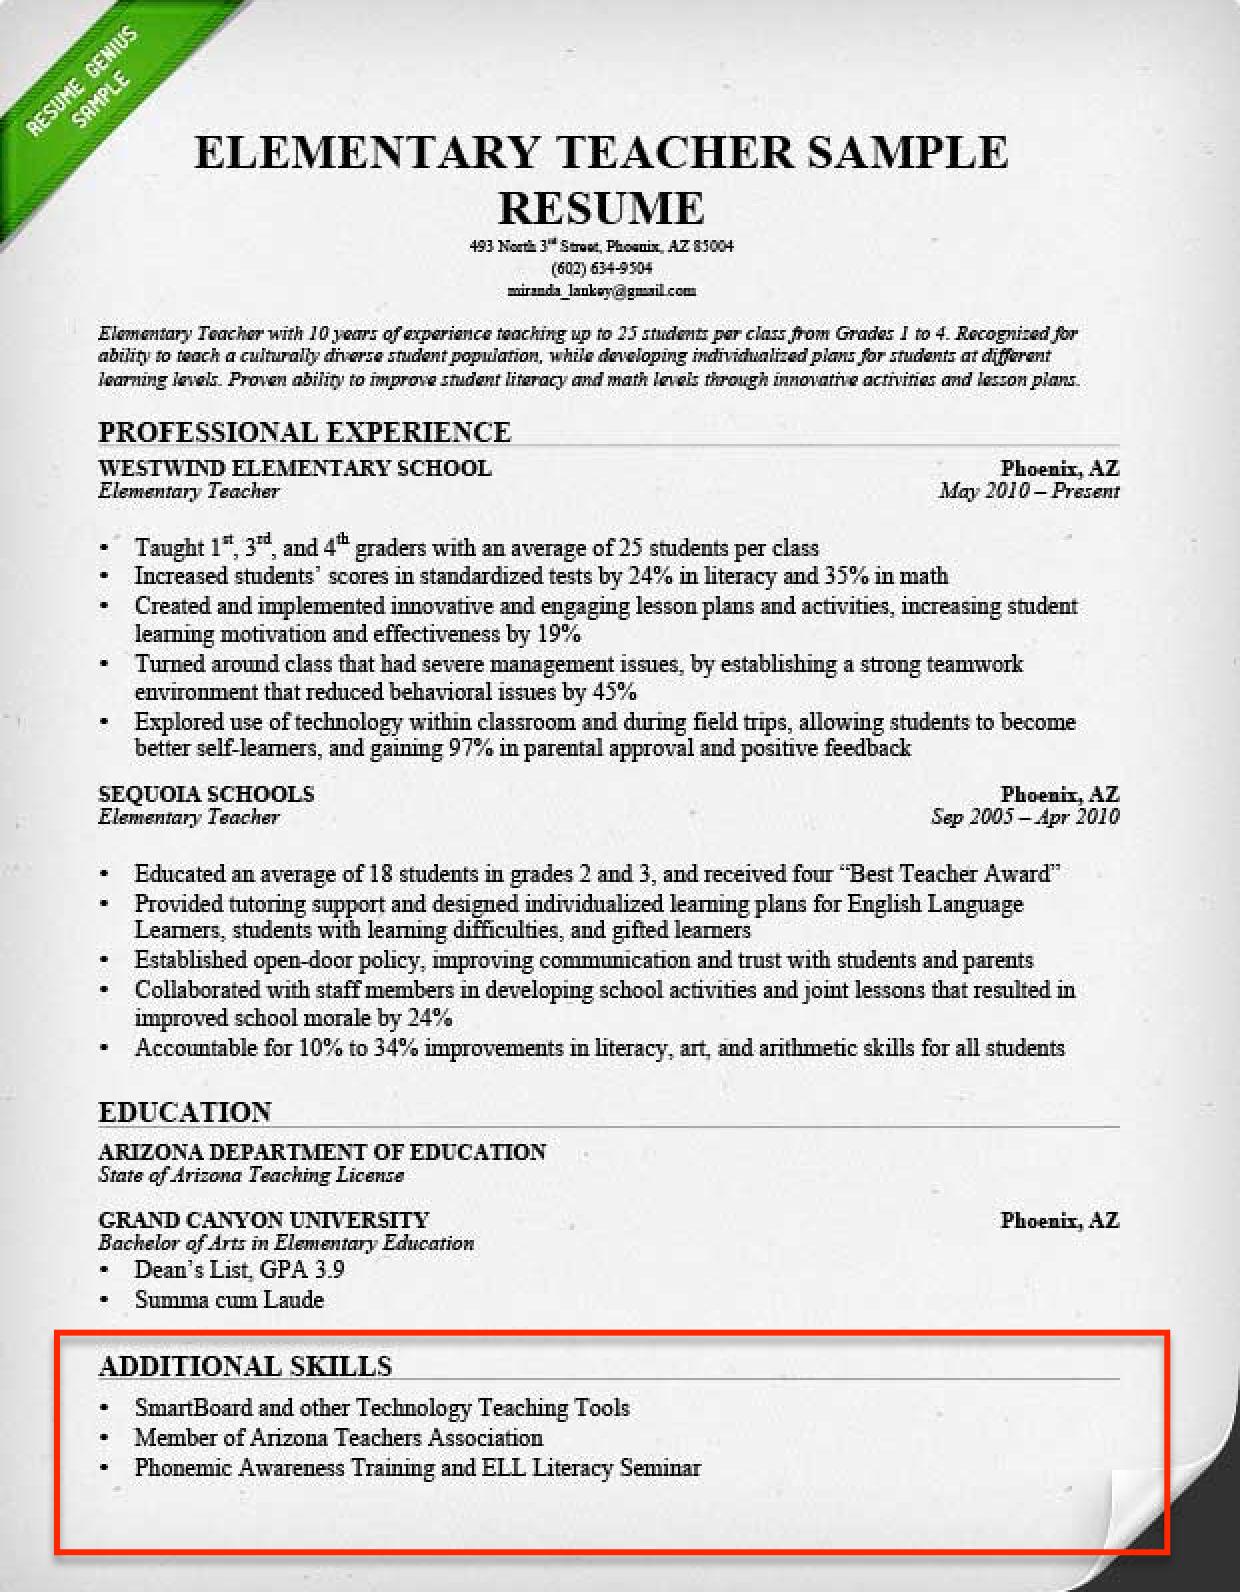 Resume Skills Section Resume Skills Teaching Skills Resume Skills List Teaching Resume In 2020 Resume Skills Section Teaching Resume Resume Skills